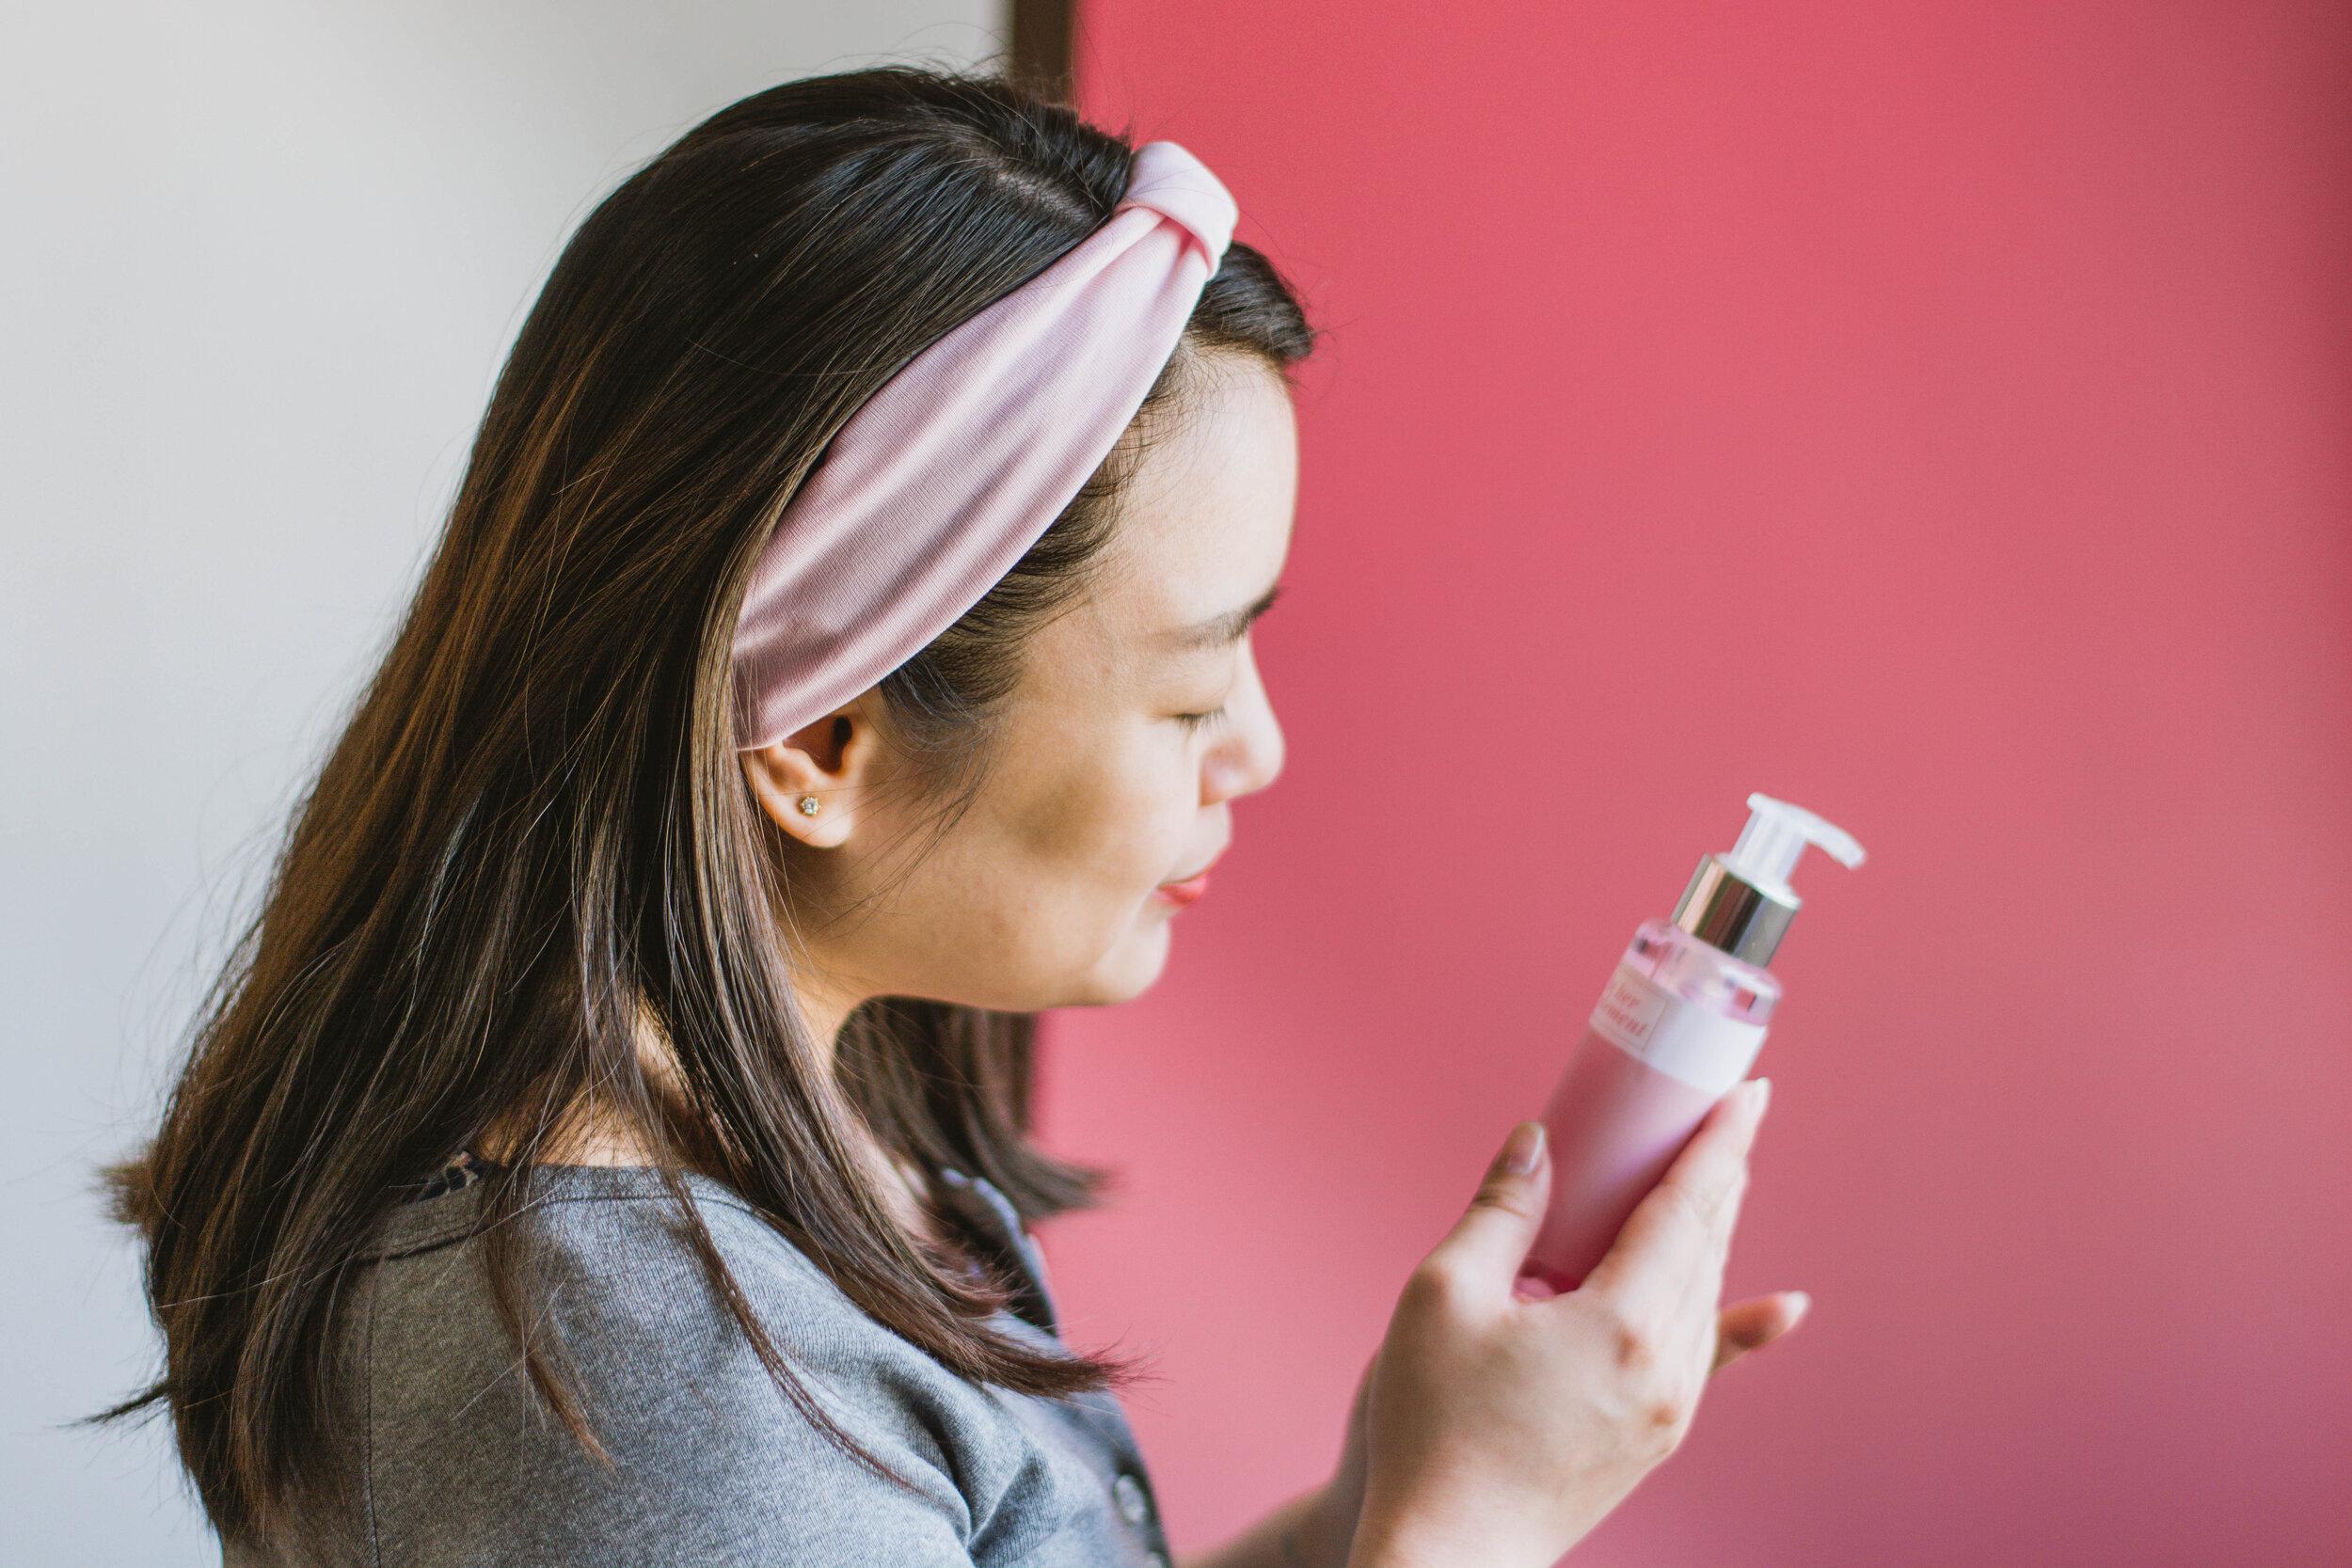 In-her-element_purchase_freebie_headband_skincare-philippines_2019_14.jpg